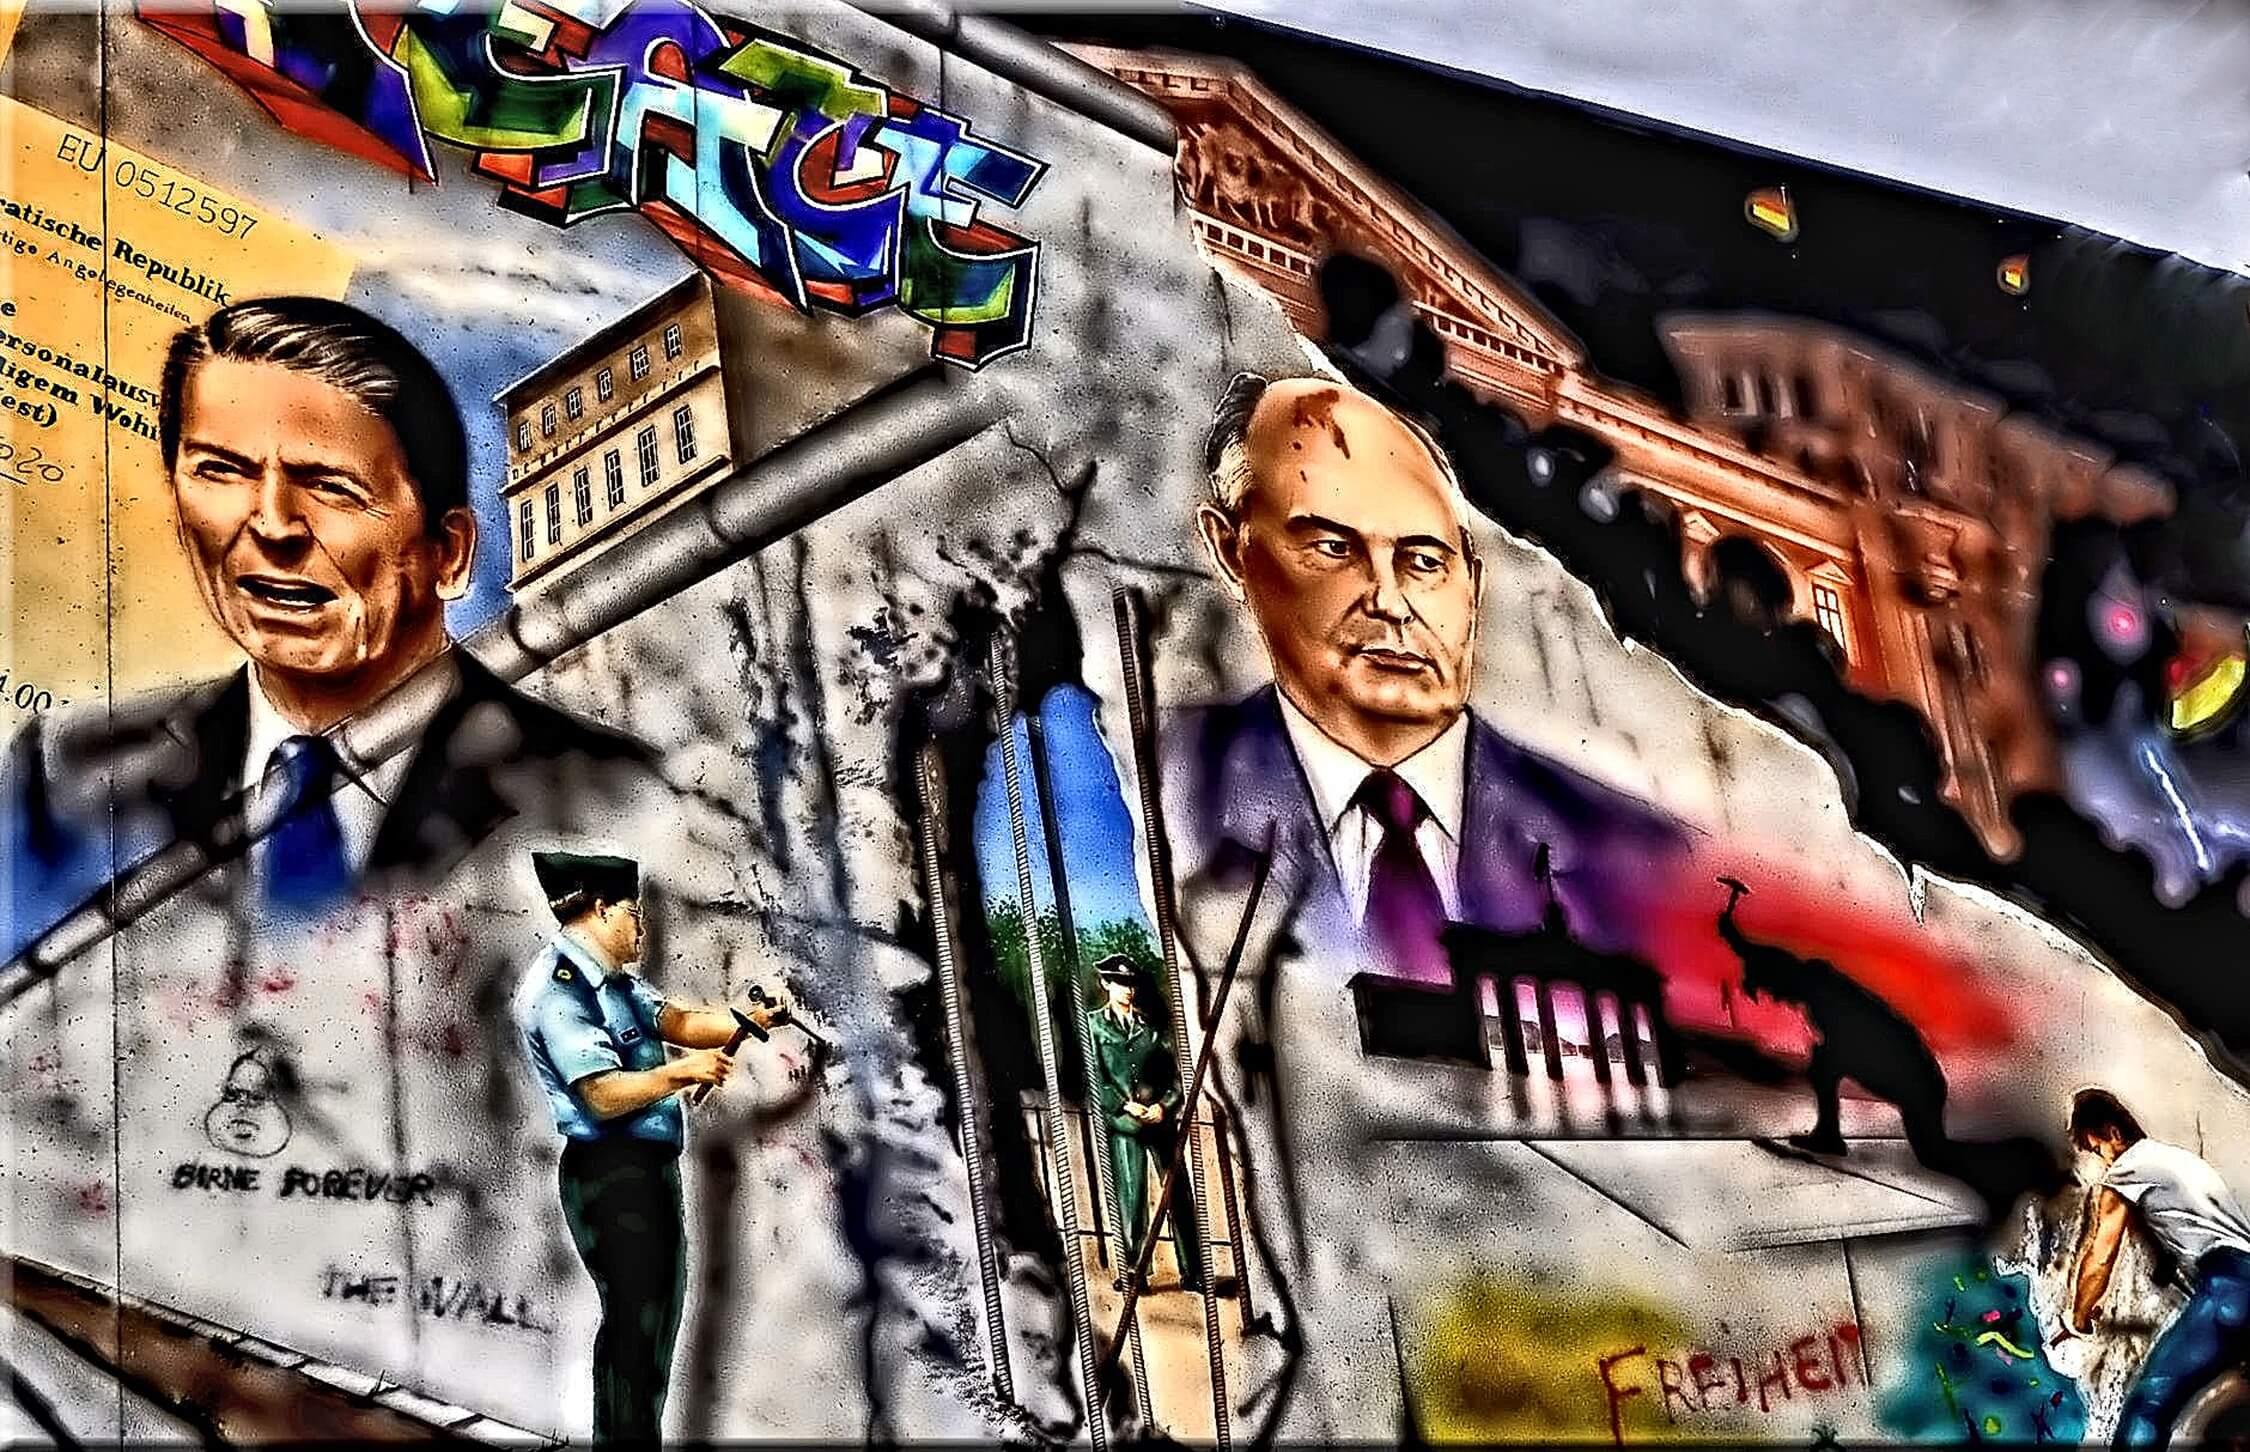 Crump-Amerikaanse President Ronald Reagan en USSR President Michail Gorbatsjov in graffiti kunst. © Pixabay